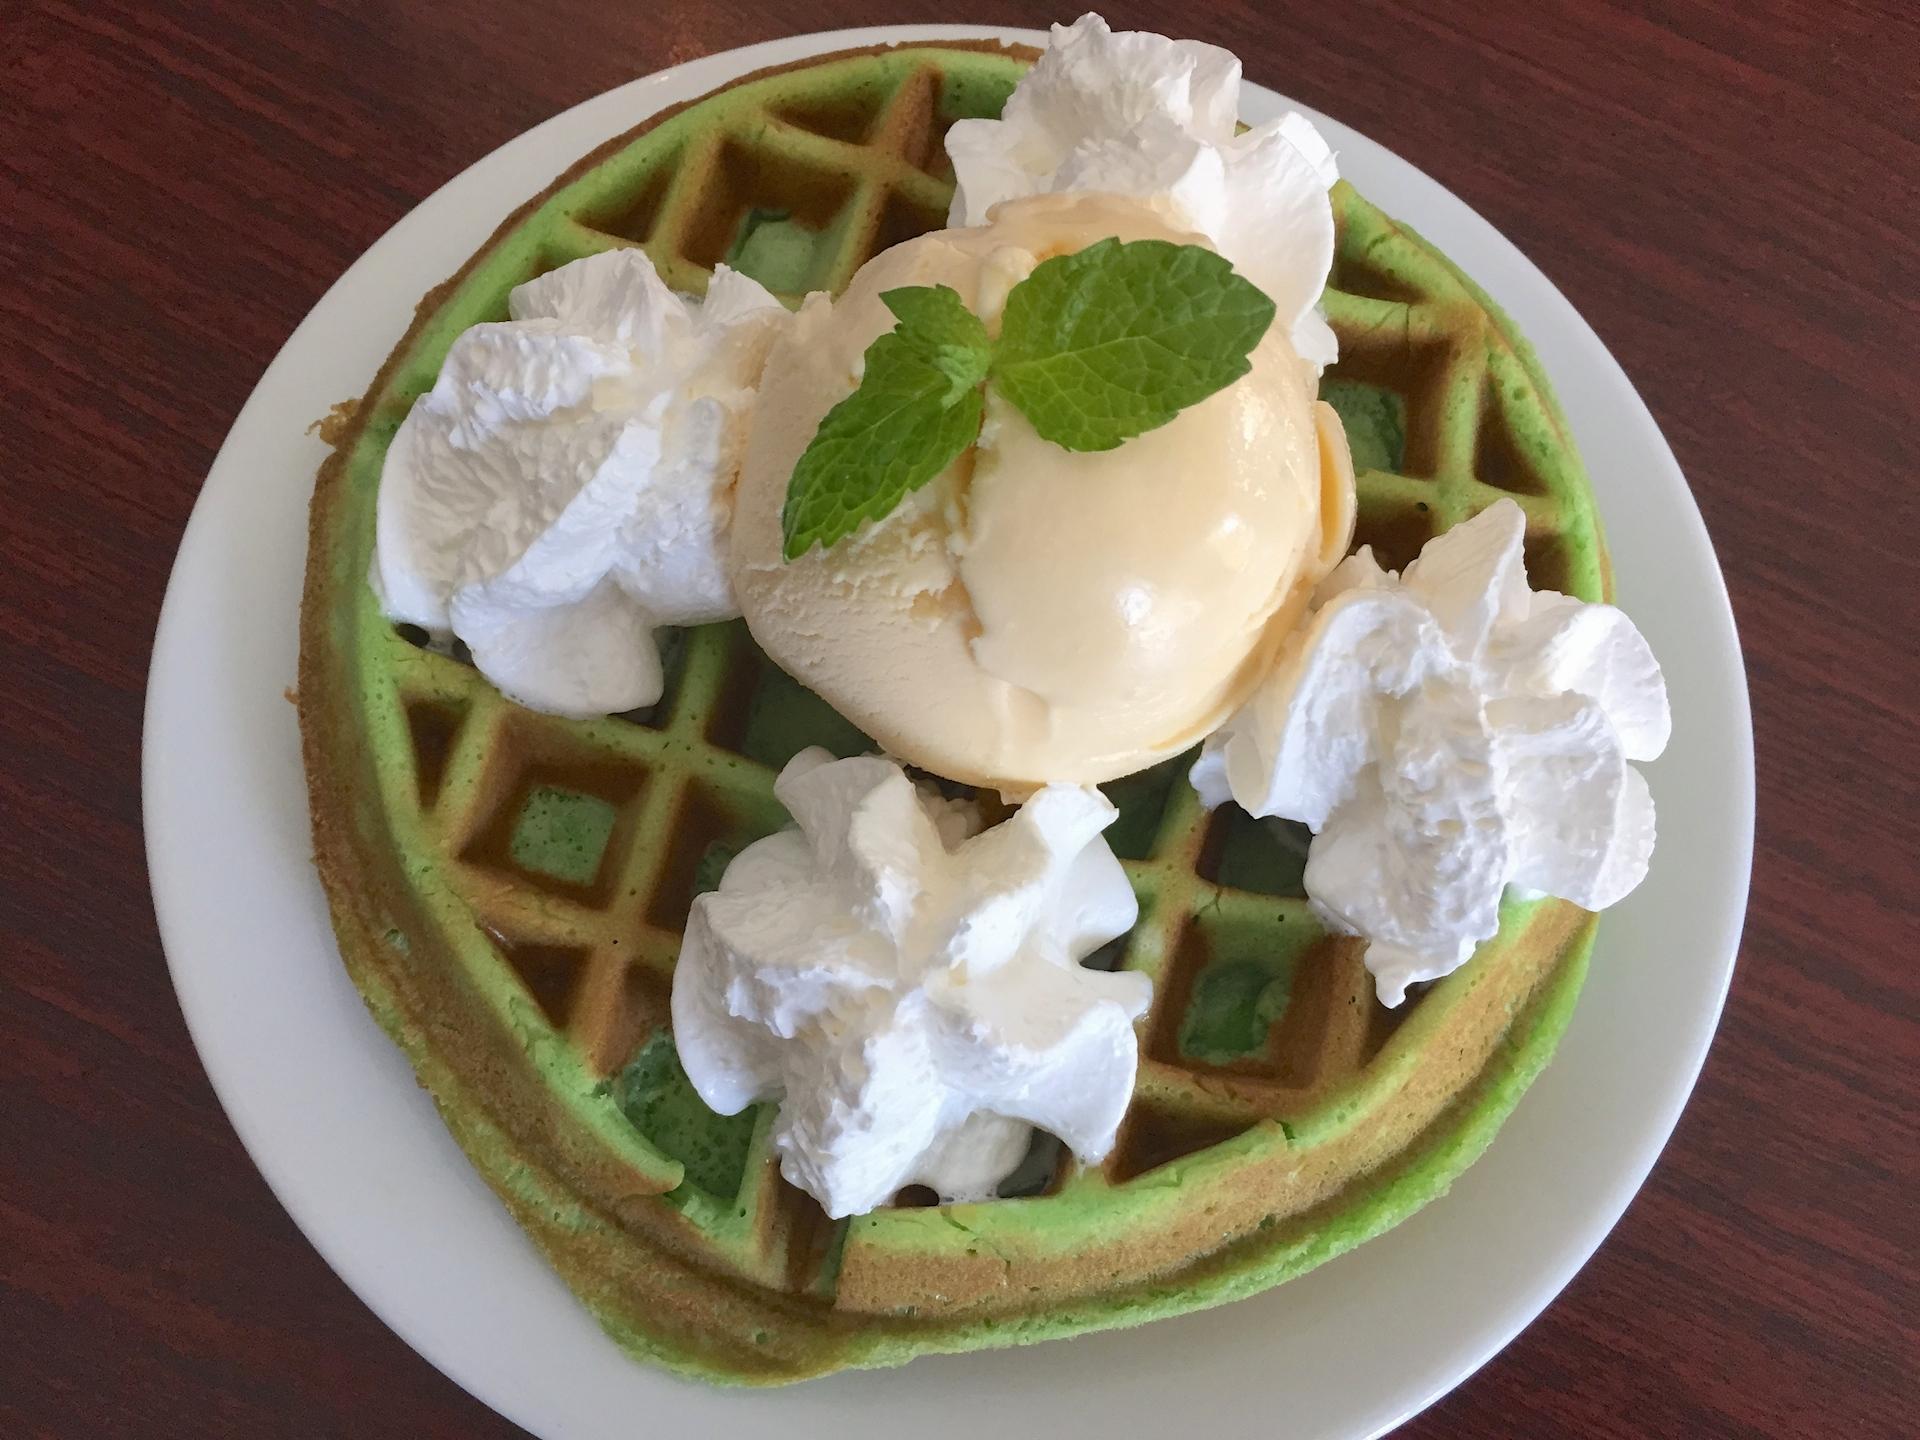 Monster Pho's pandan waffle dessert.